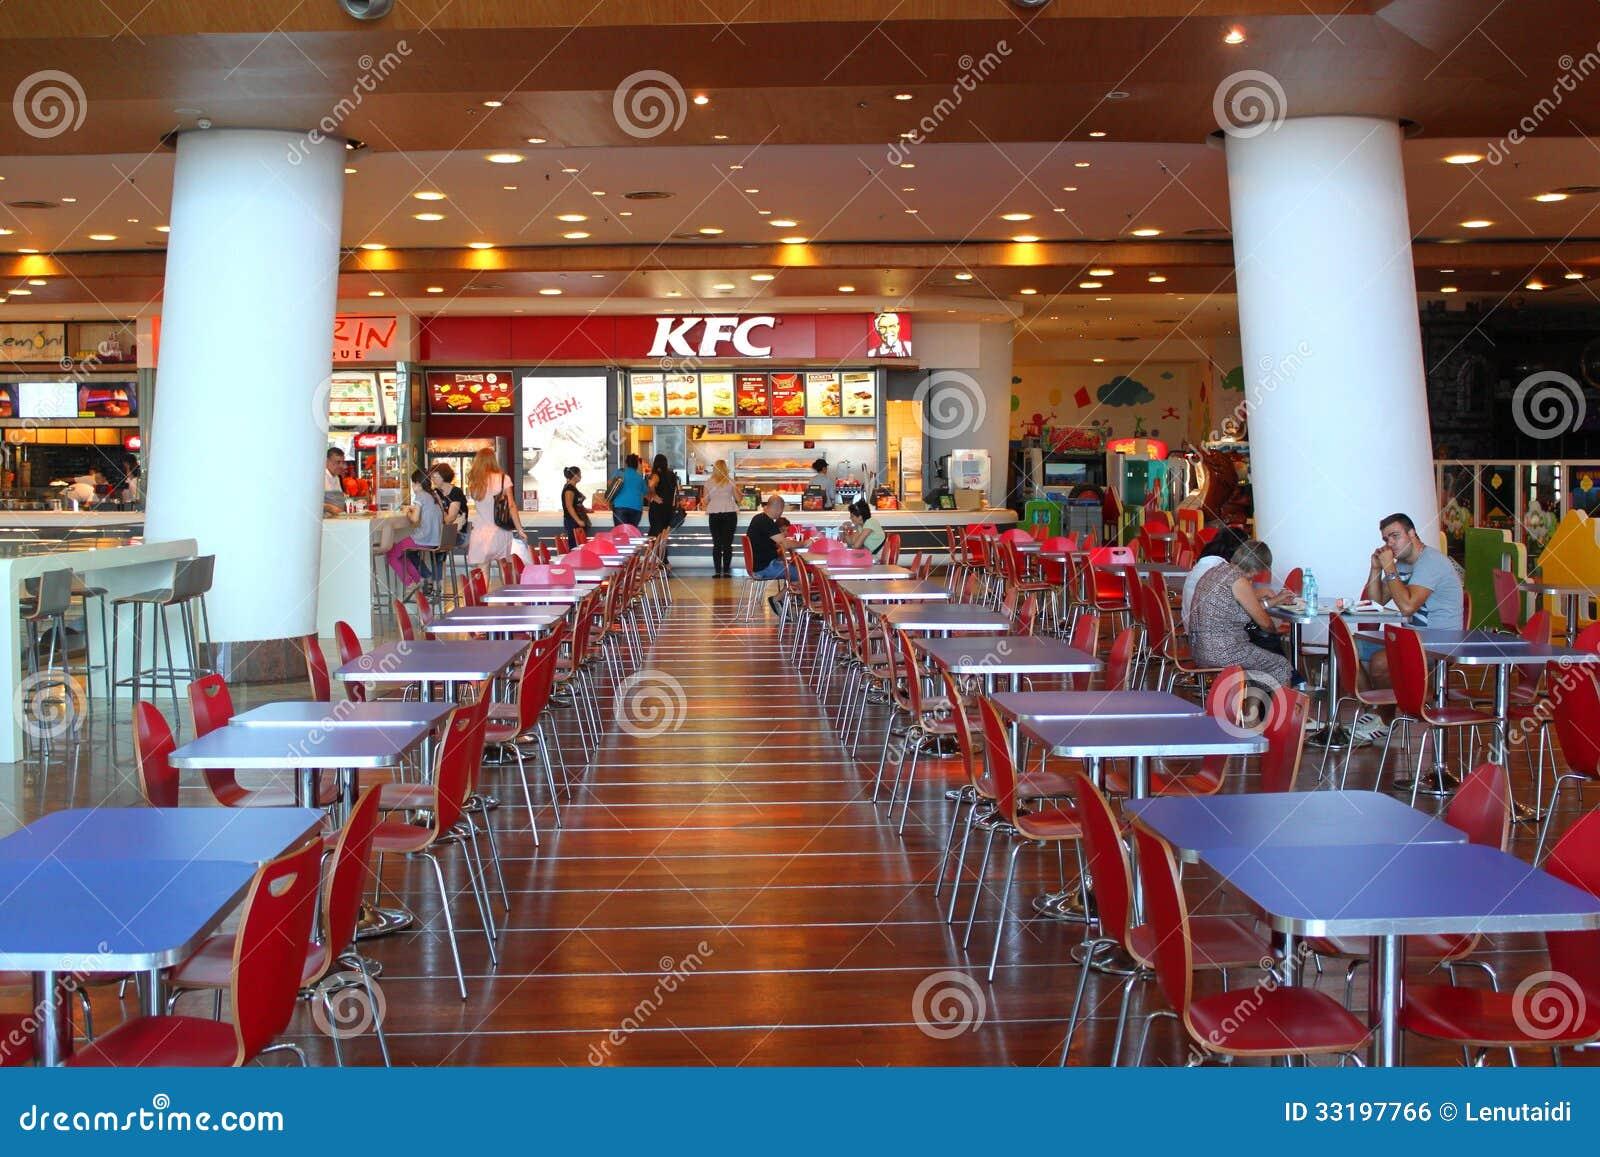 Customers Buying Fast Food At Kfc Editorial Photo Image